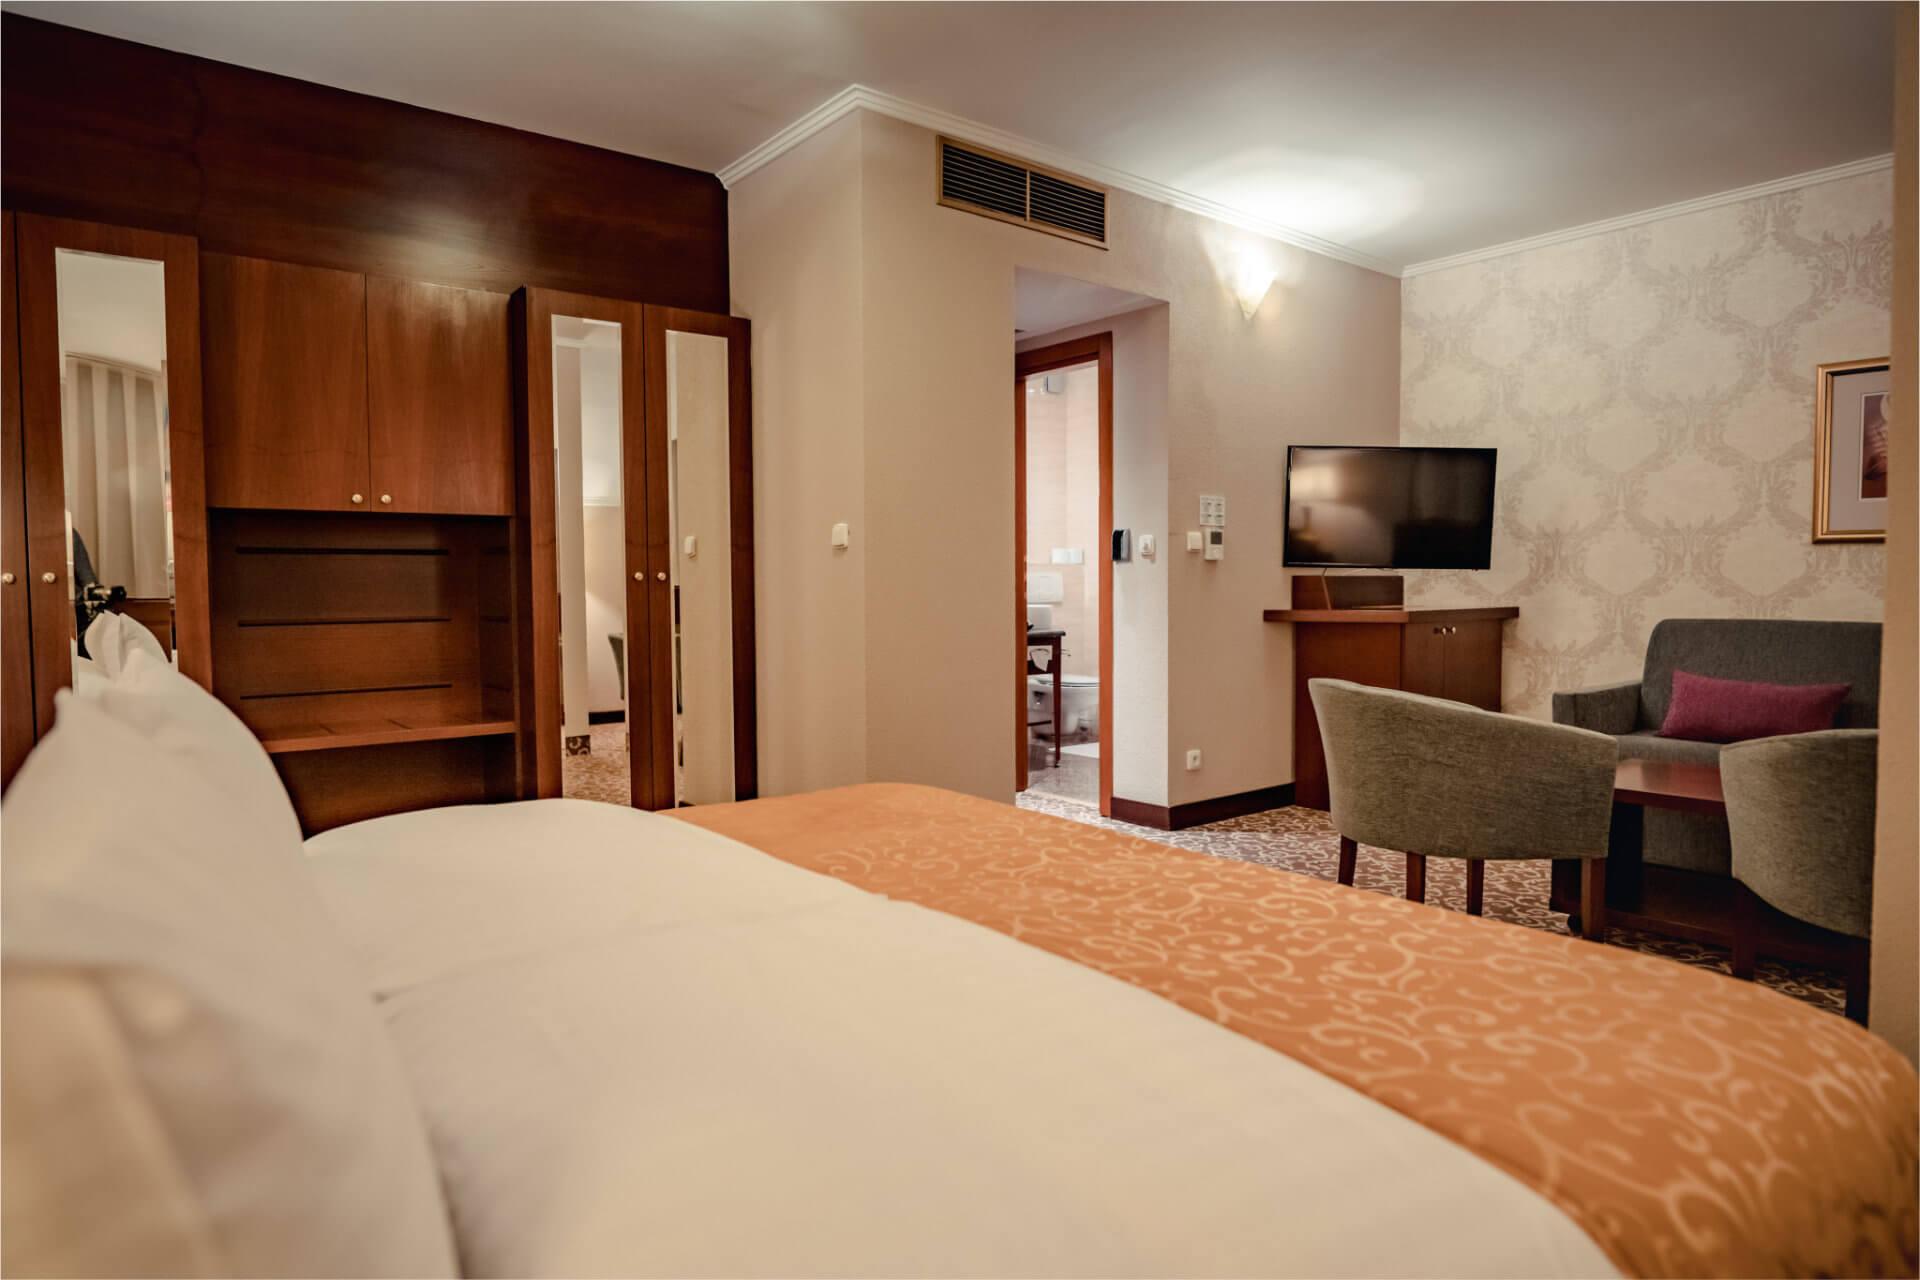 1-room suite LUX